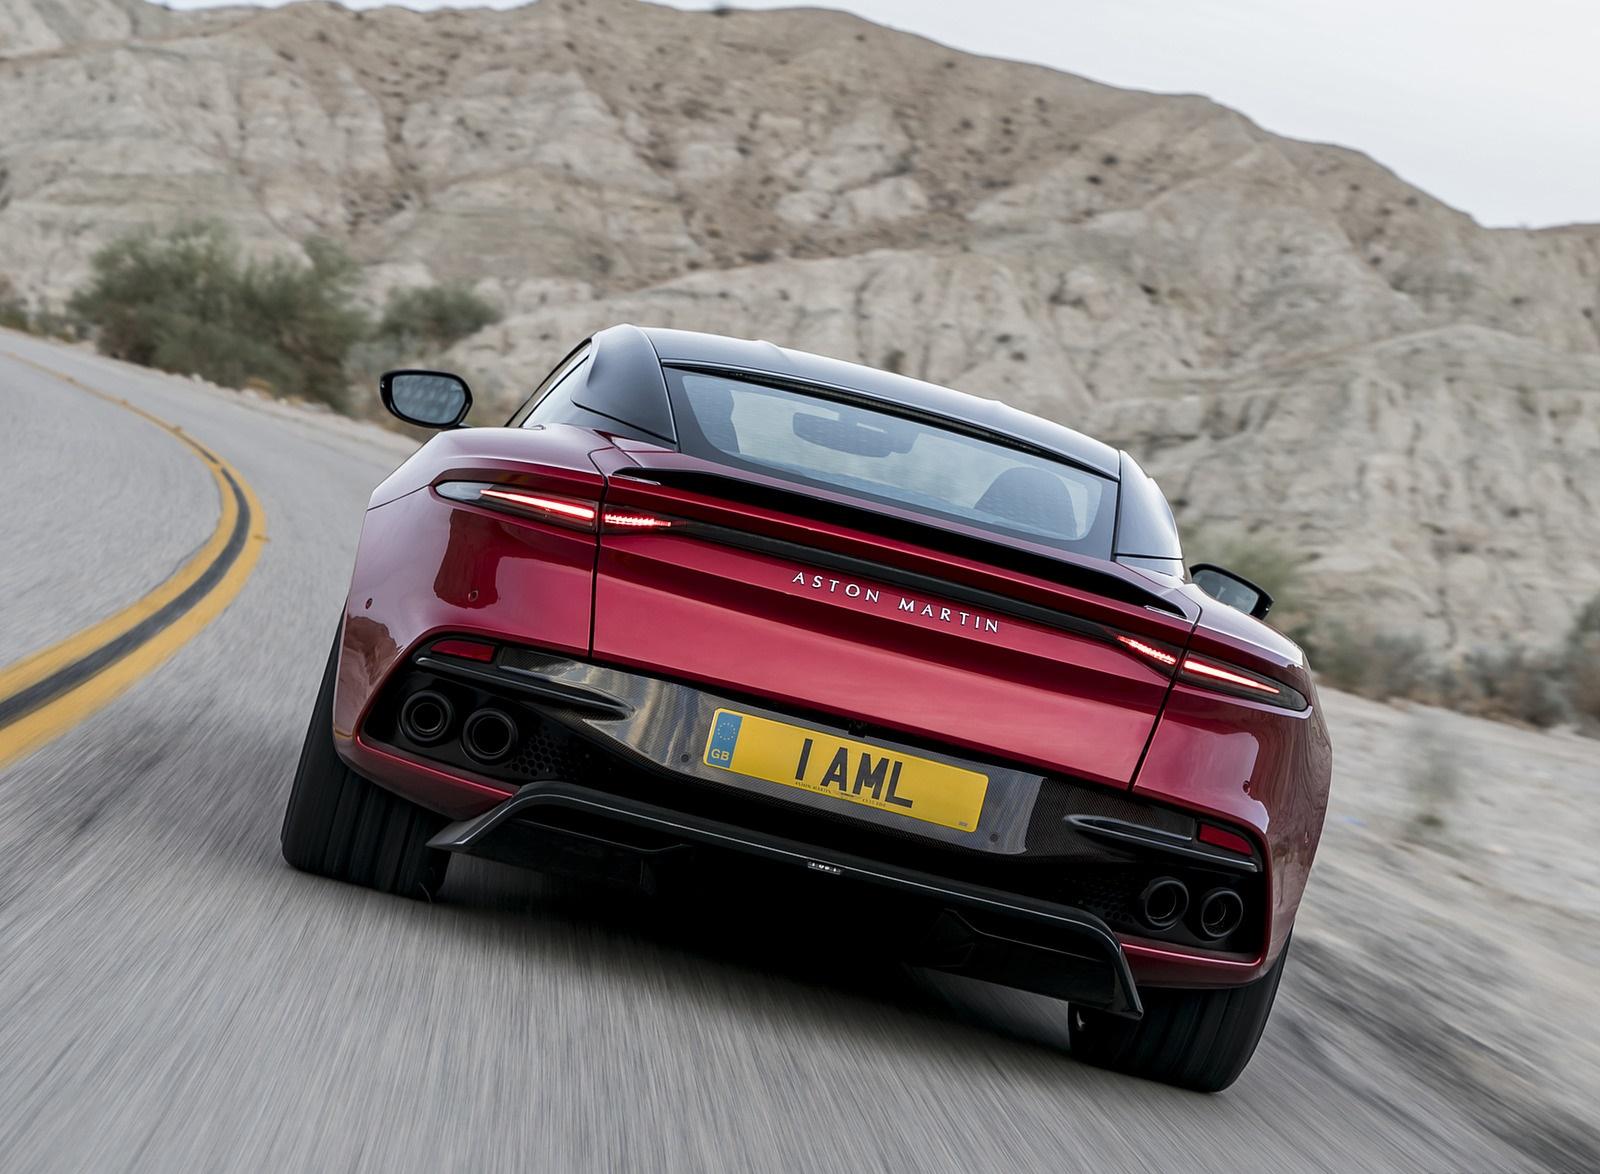 2019 Aston Martin DBS Superleggera Rear Wallpapers (5)